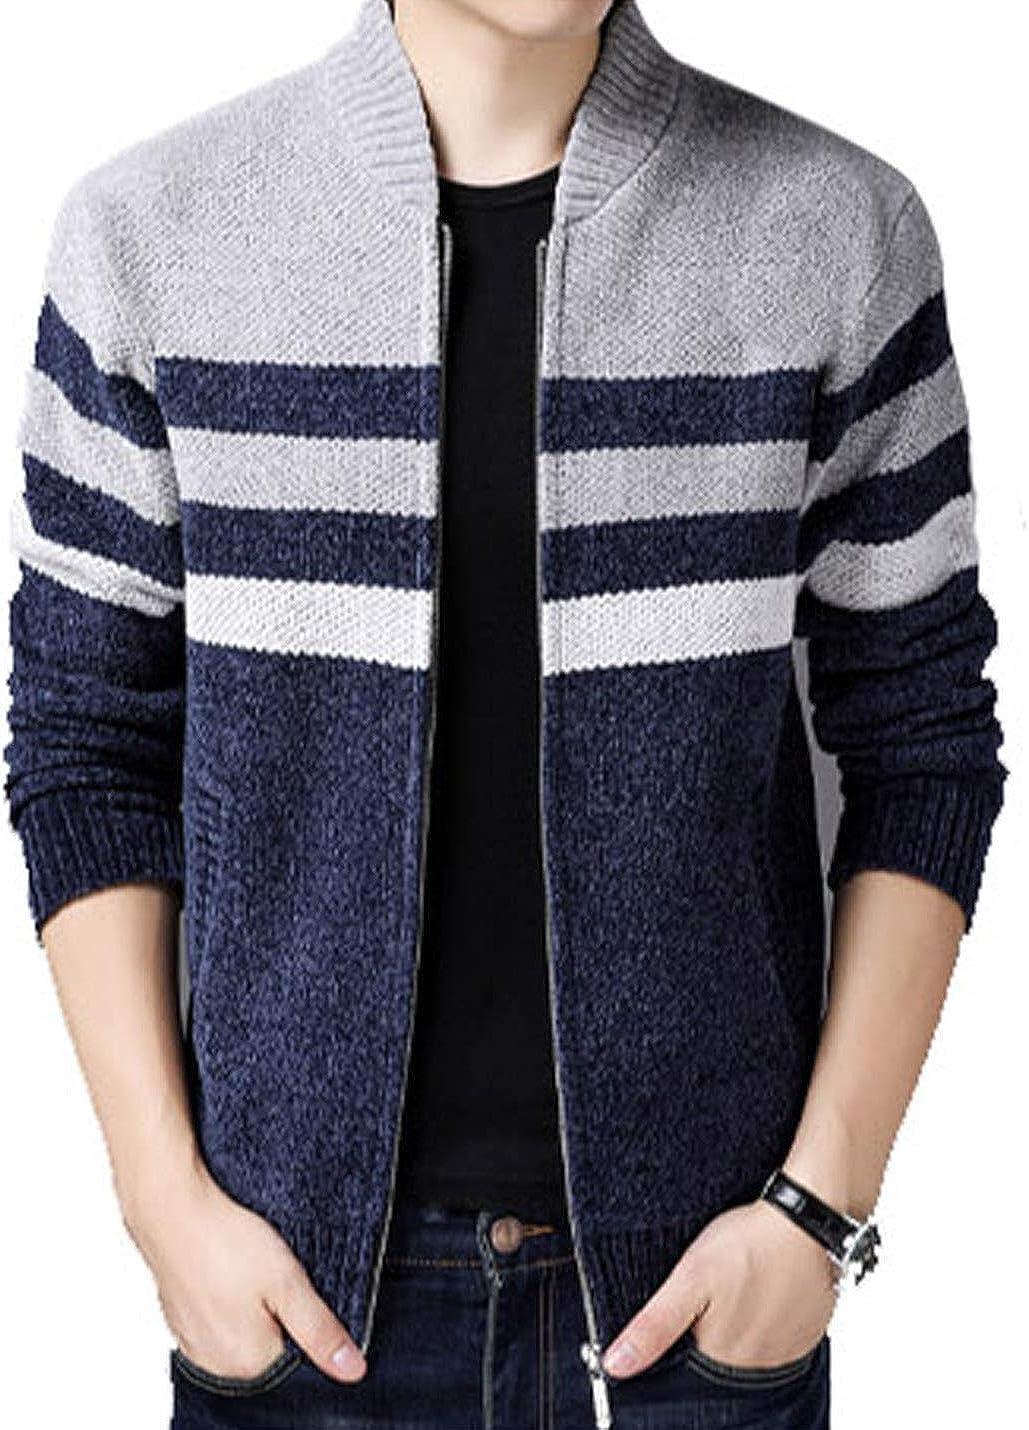 Yeokou Men's Autumn Fashion Casual Wide Stripes Zipper Knitted Cardigan Sweater